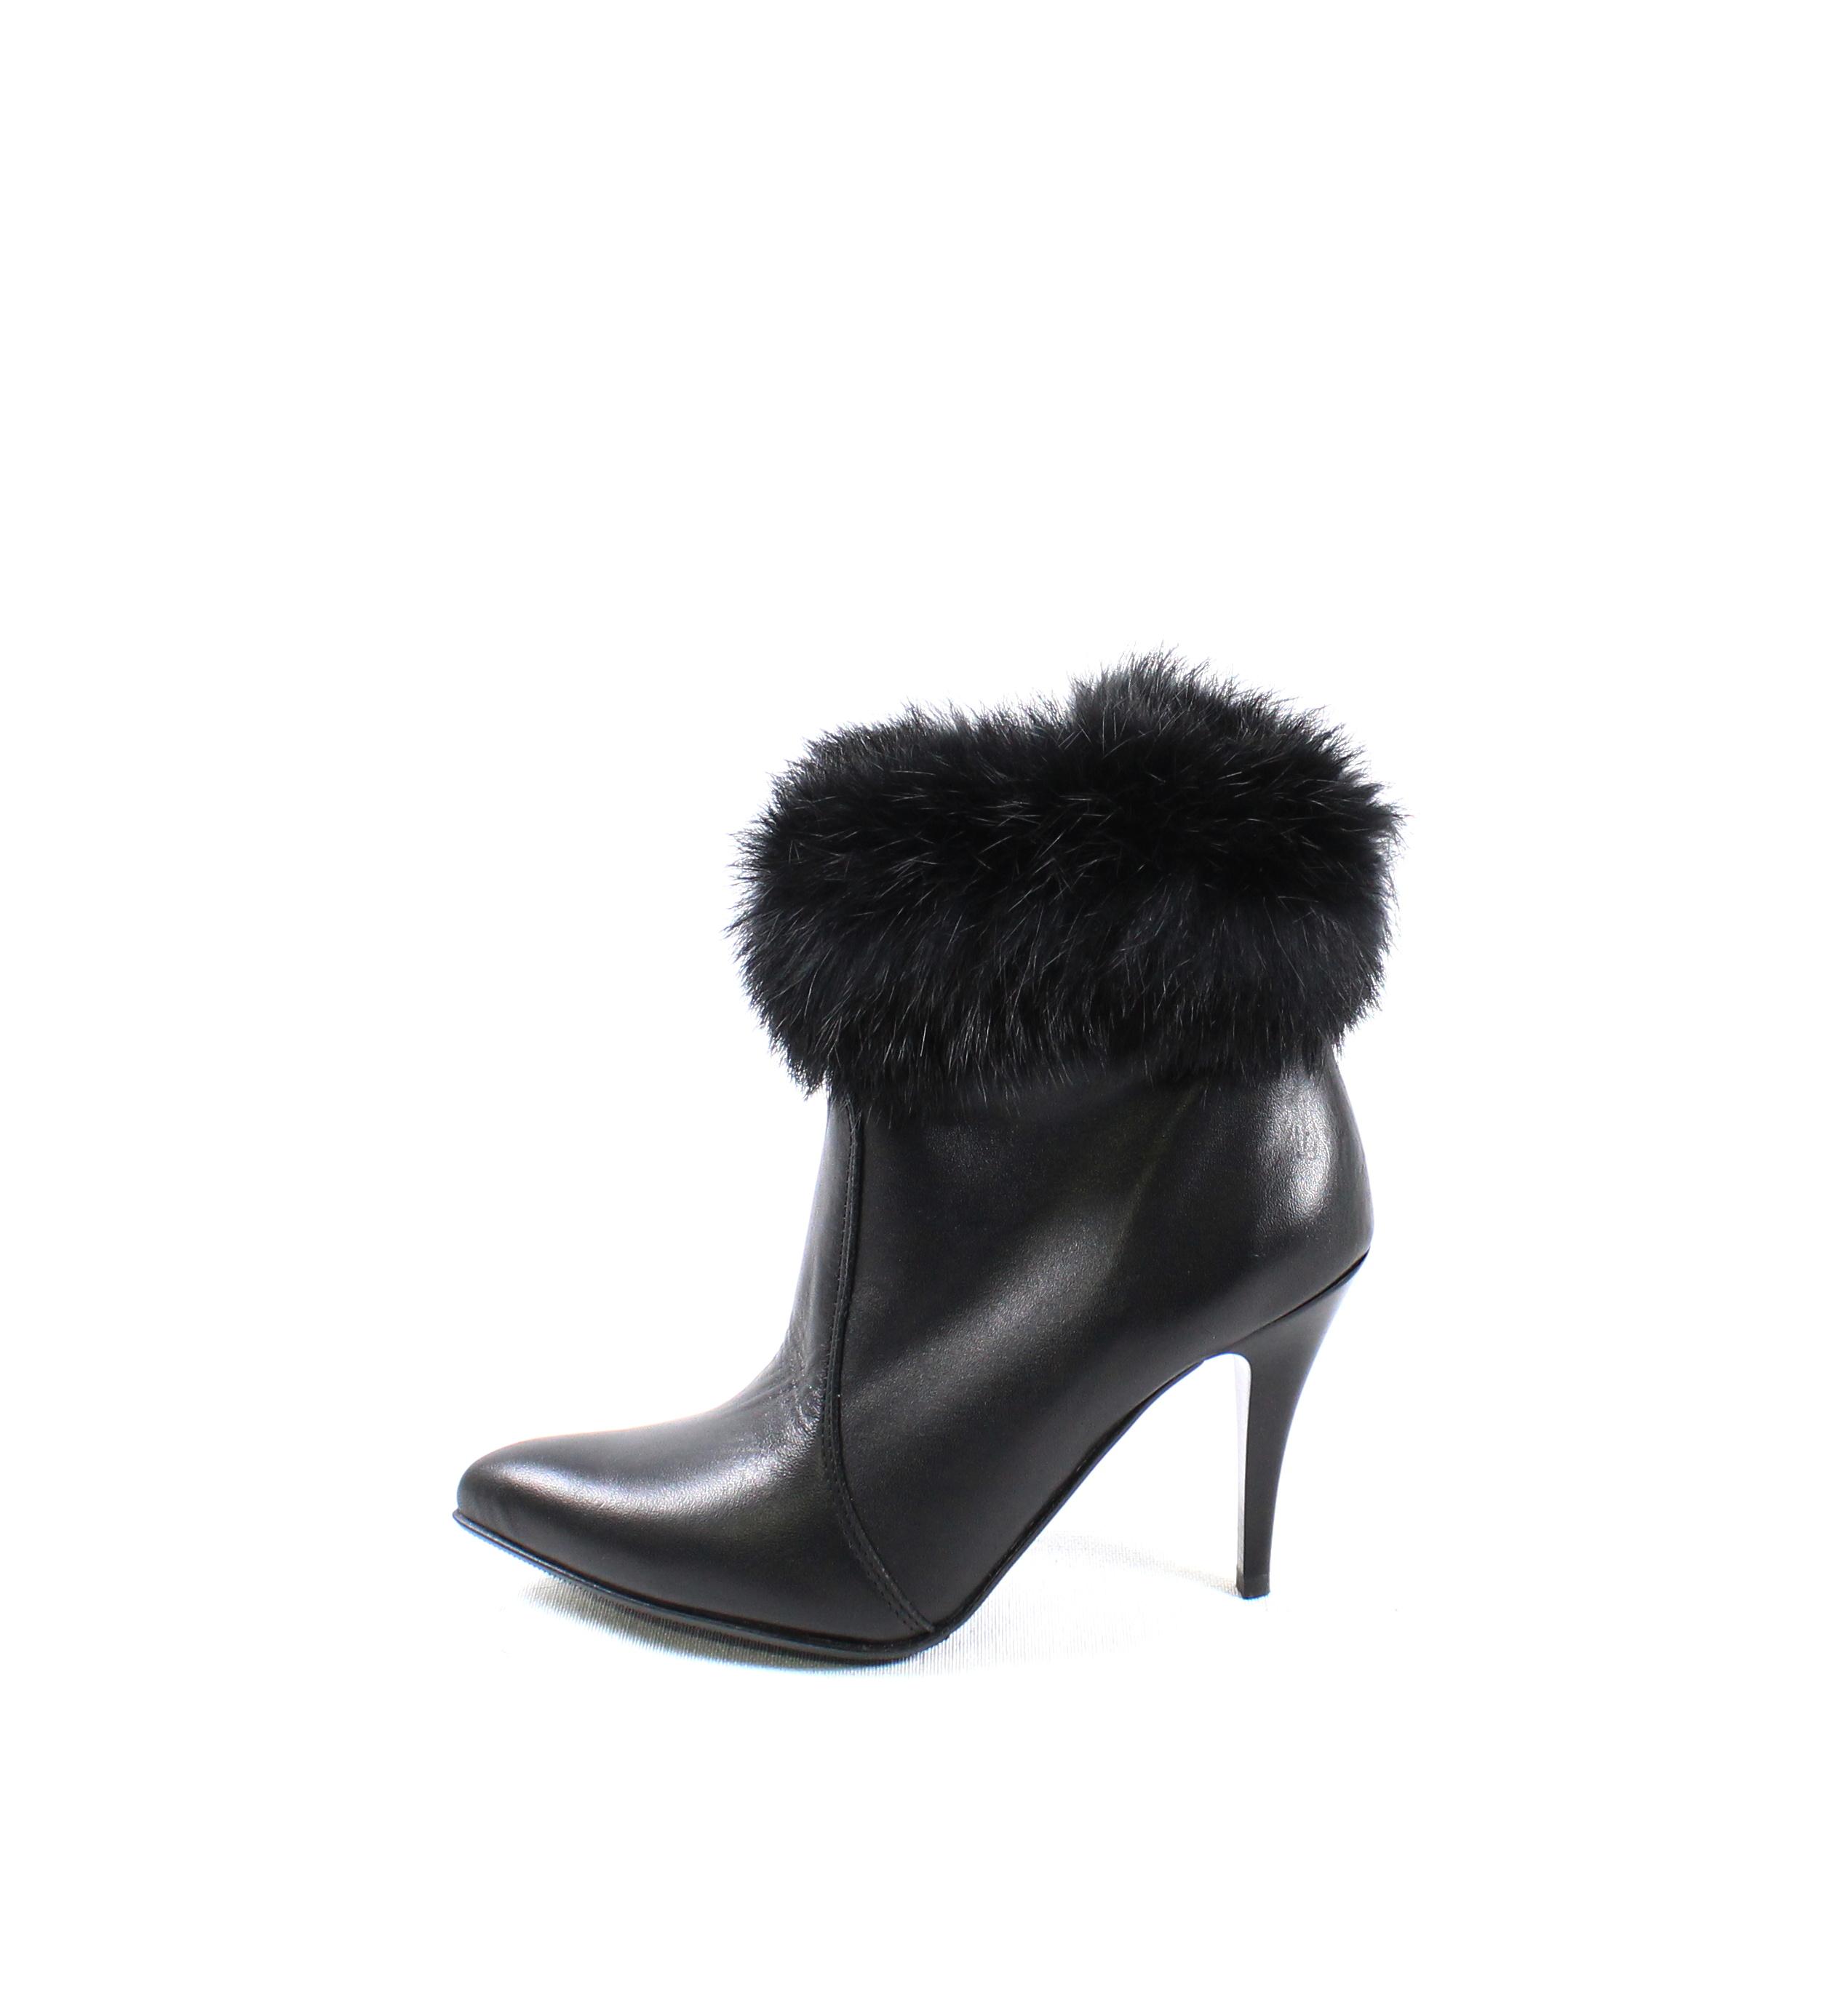 0055c37e39 Dámske členkové čižmy CLAUDIO DESSI 5208 – Topánky Olympia shoes